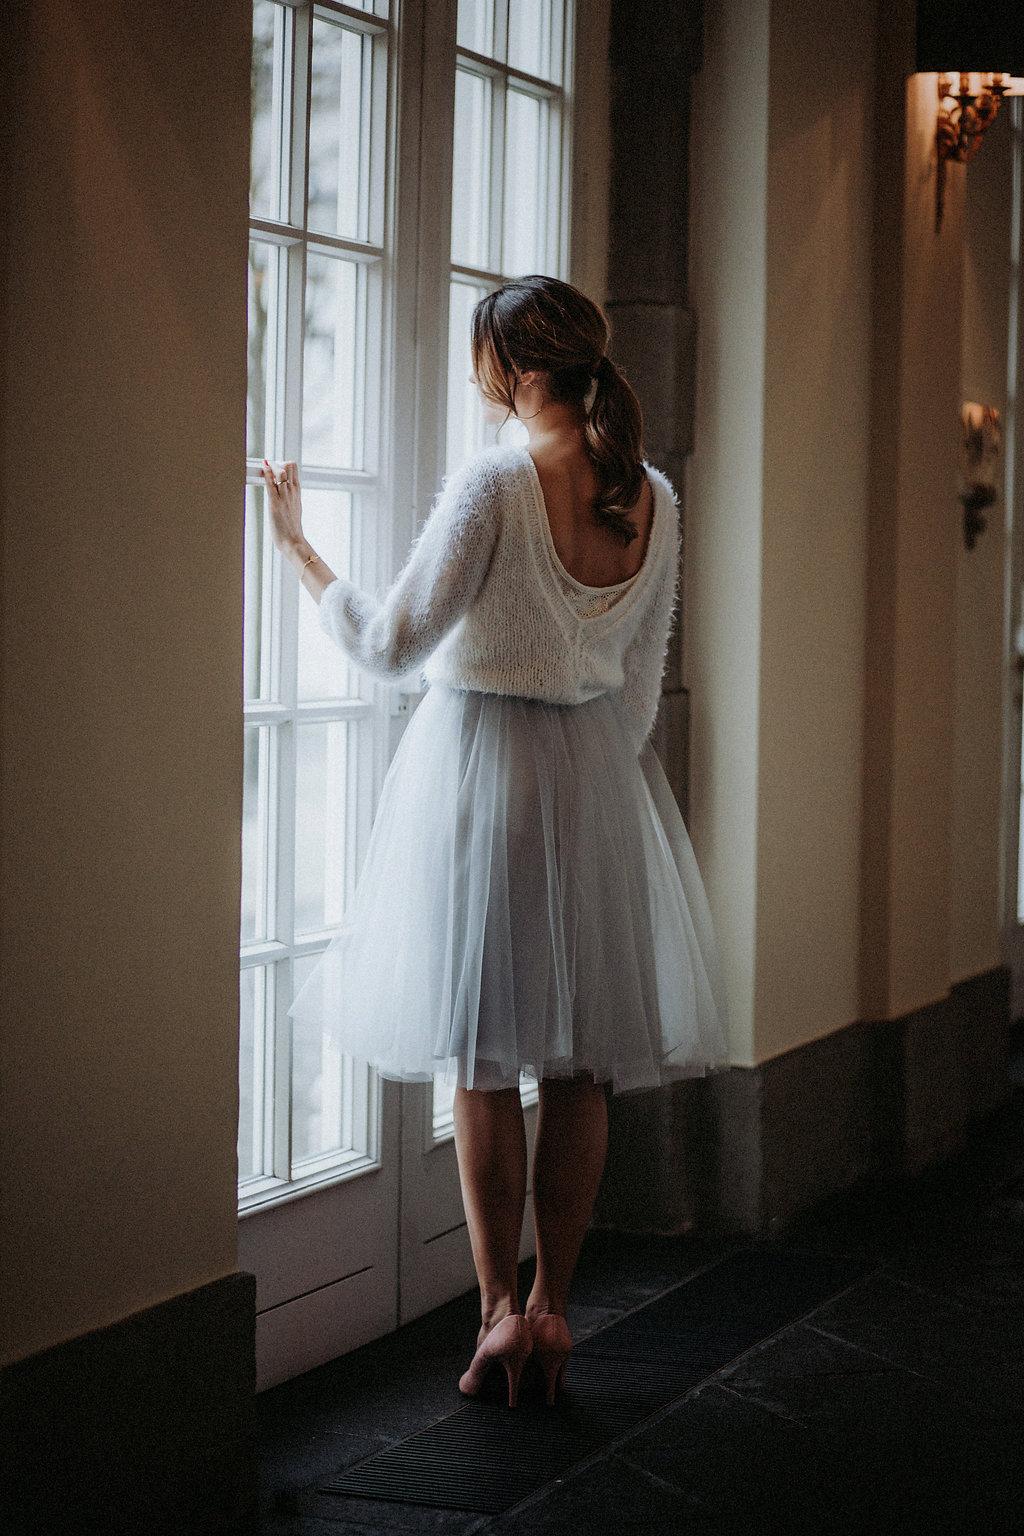 Moderner Braut Pullover rueckenfrei (Foto: Daniela Maquardt)